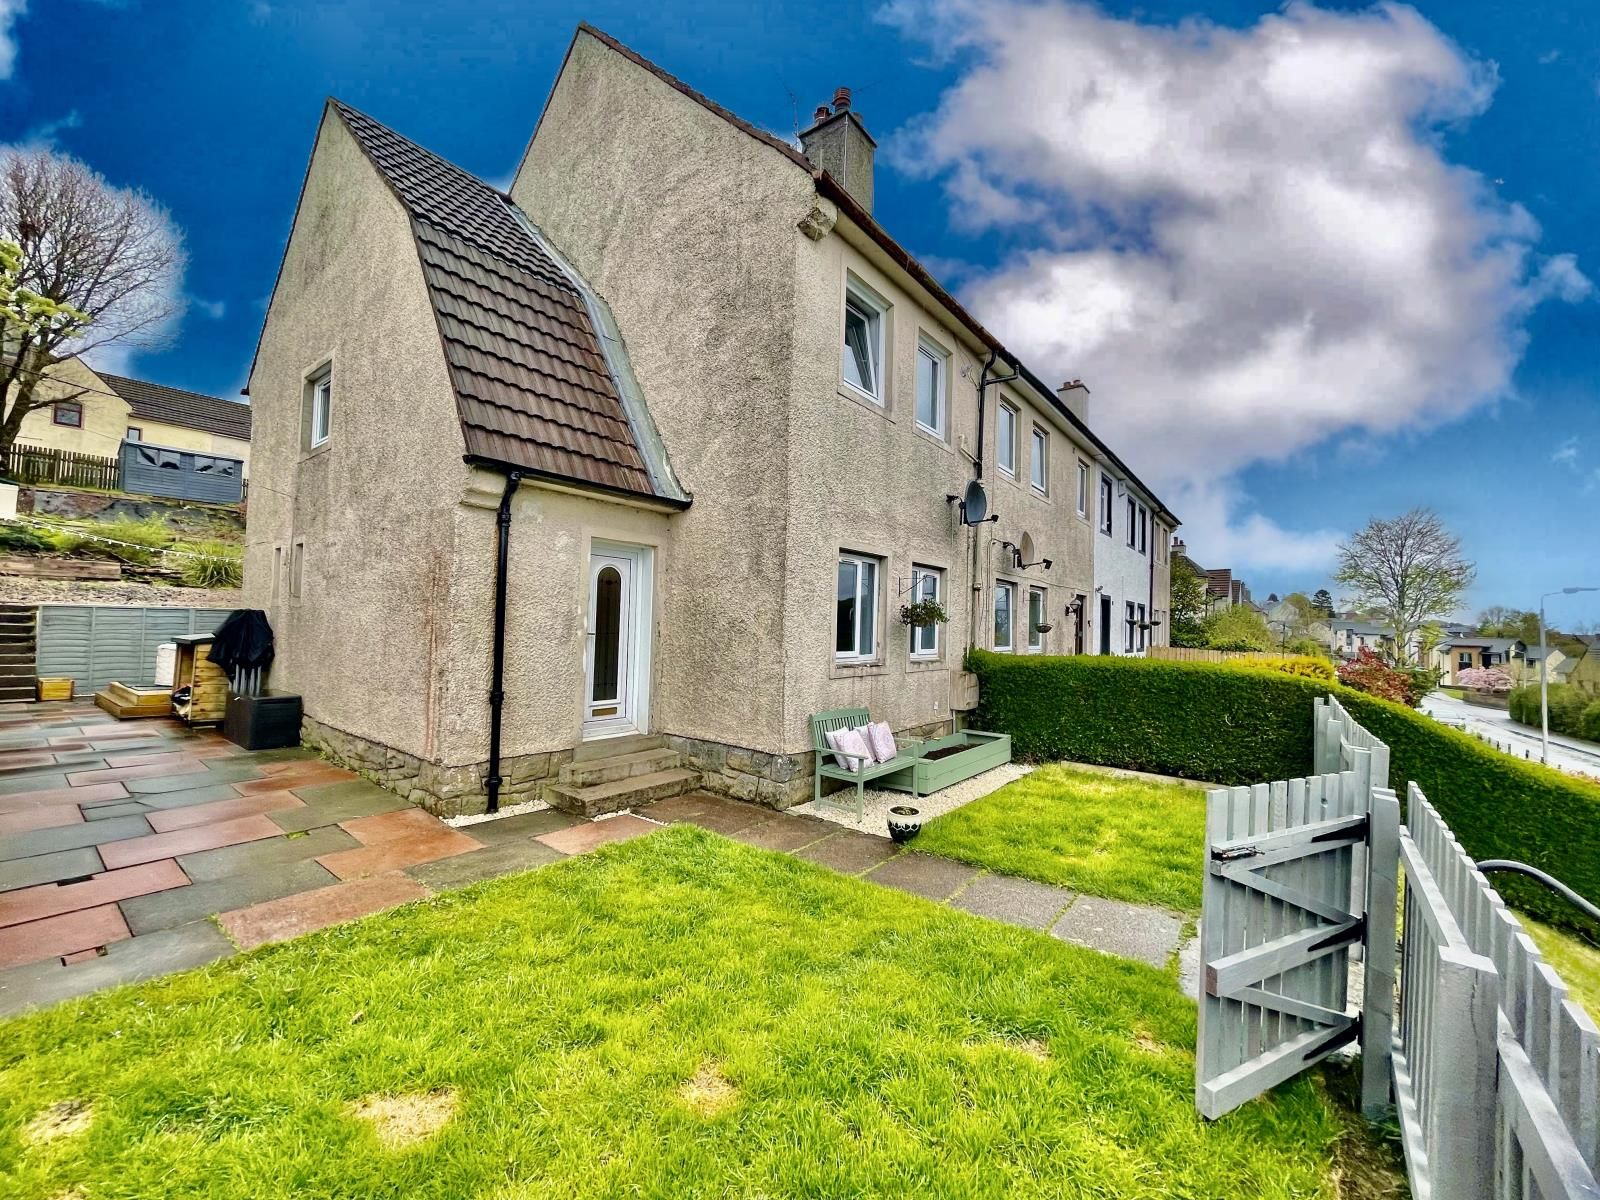 Property photo 1 of 23. Crvf0509.Jpg